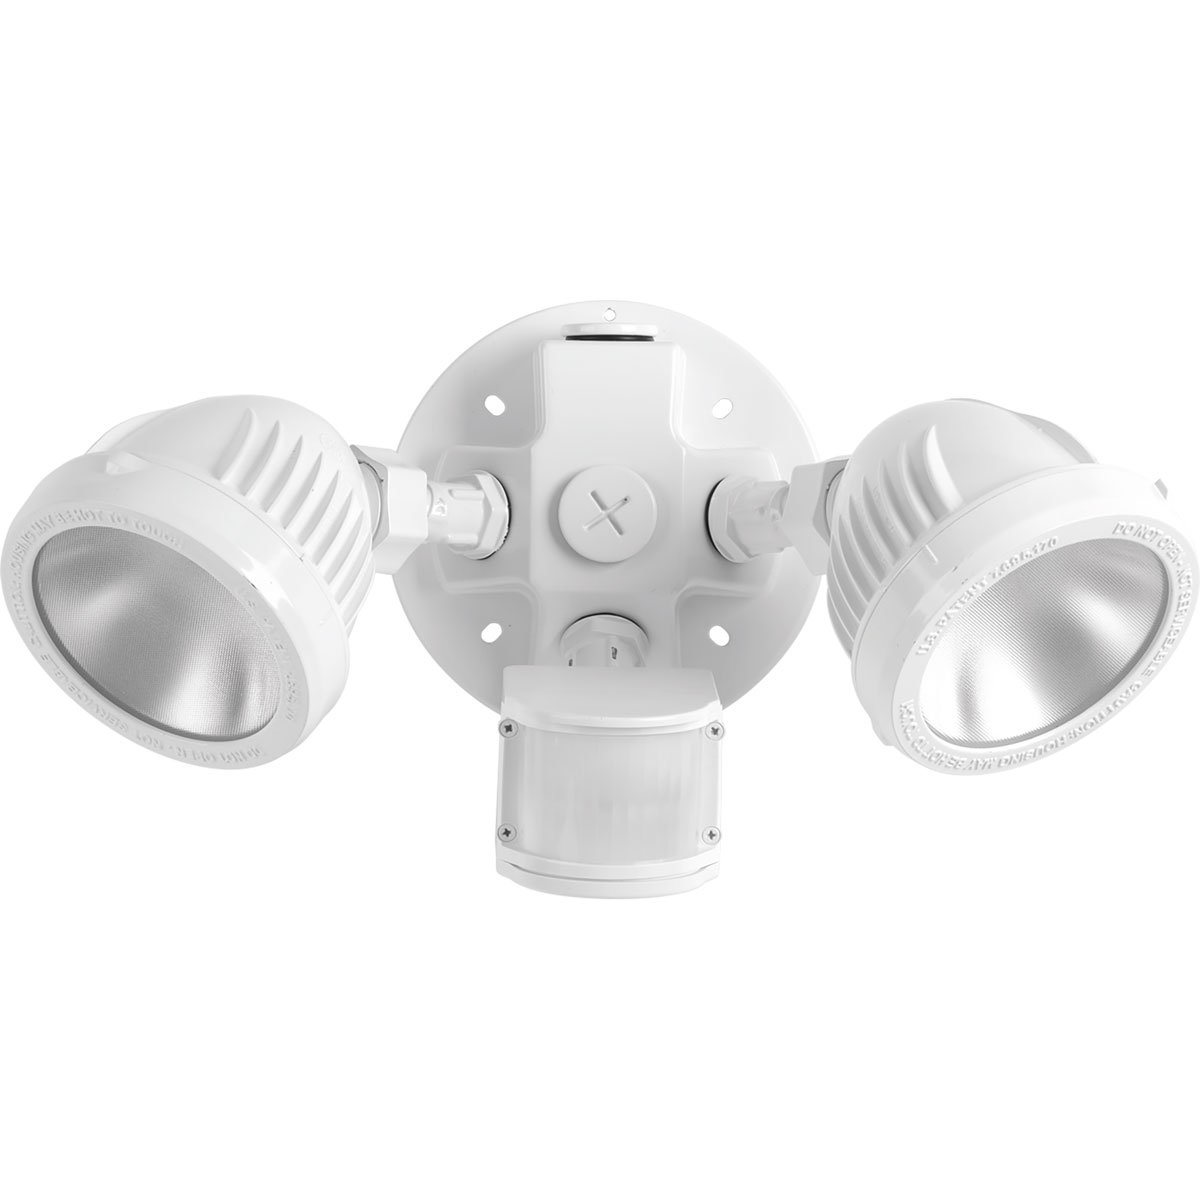 Progress Lighting P6341-2830K Floodlights Flood Light with Motion Sensor White 1000 lumens